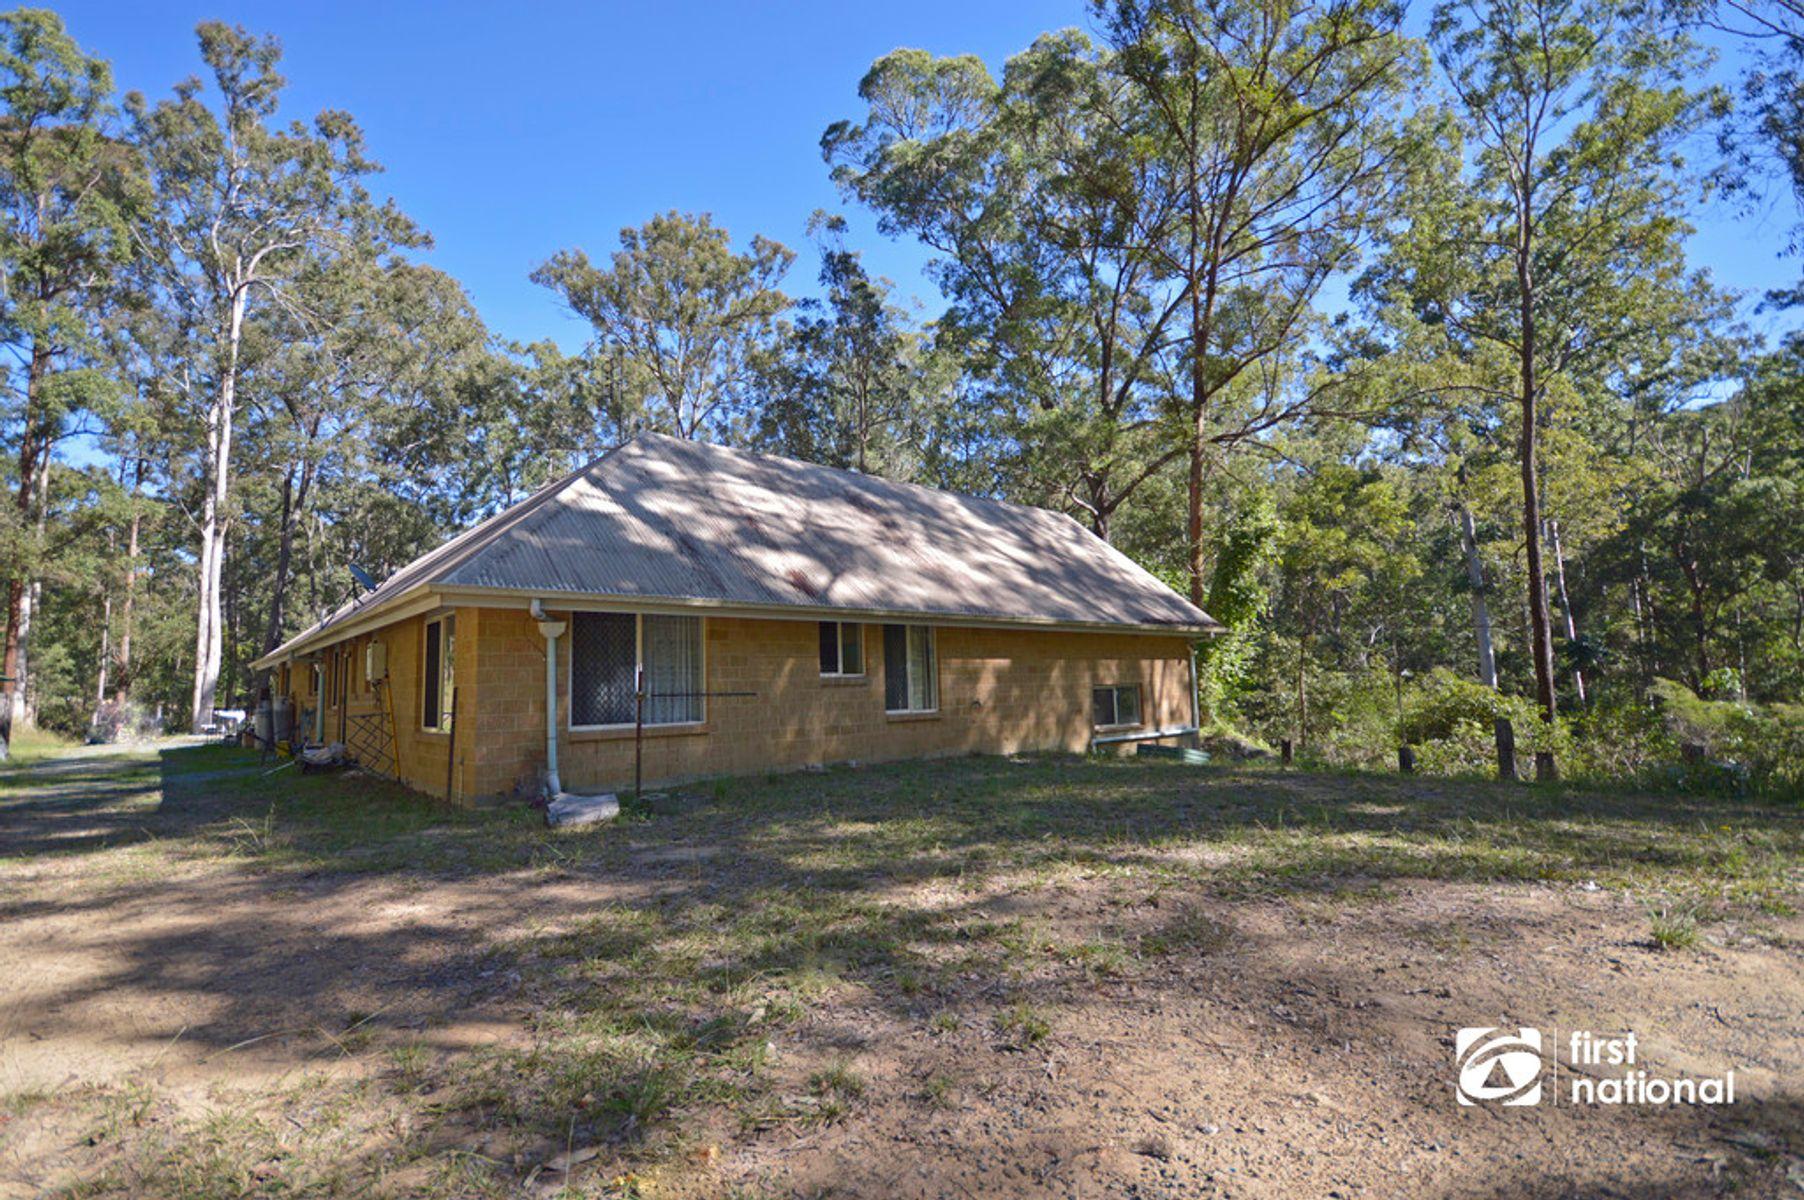 76 Cedar Creek Falls Rd, Tamborine, QLD 4270